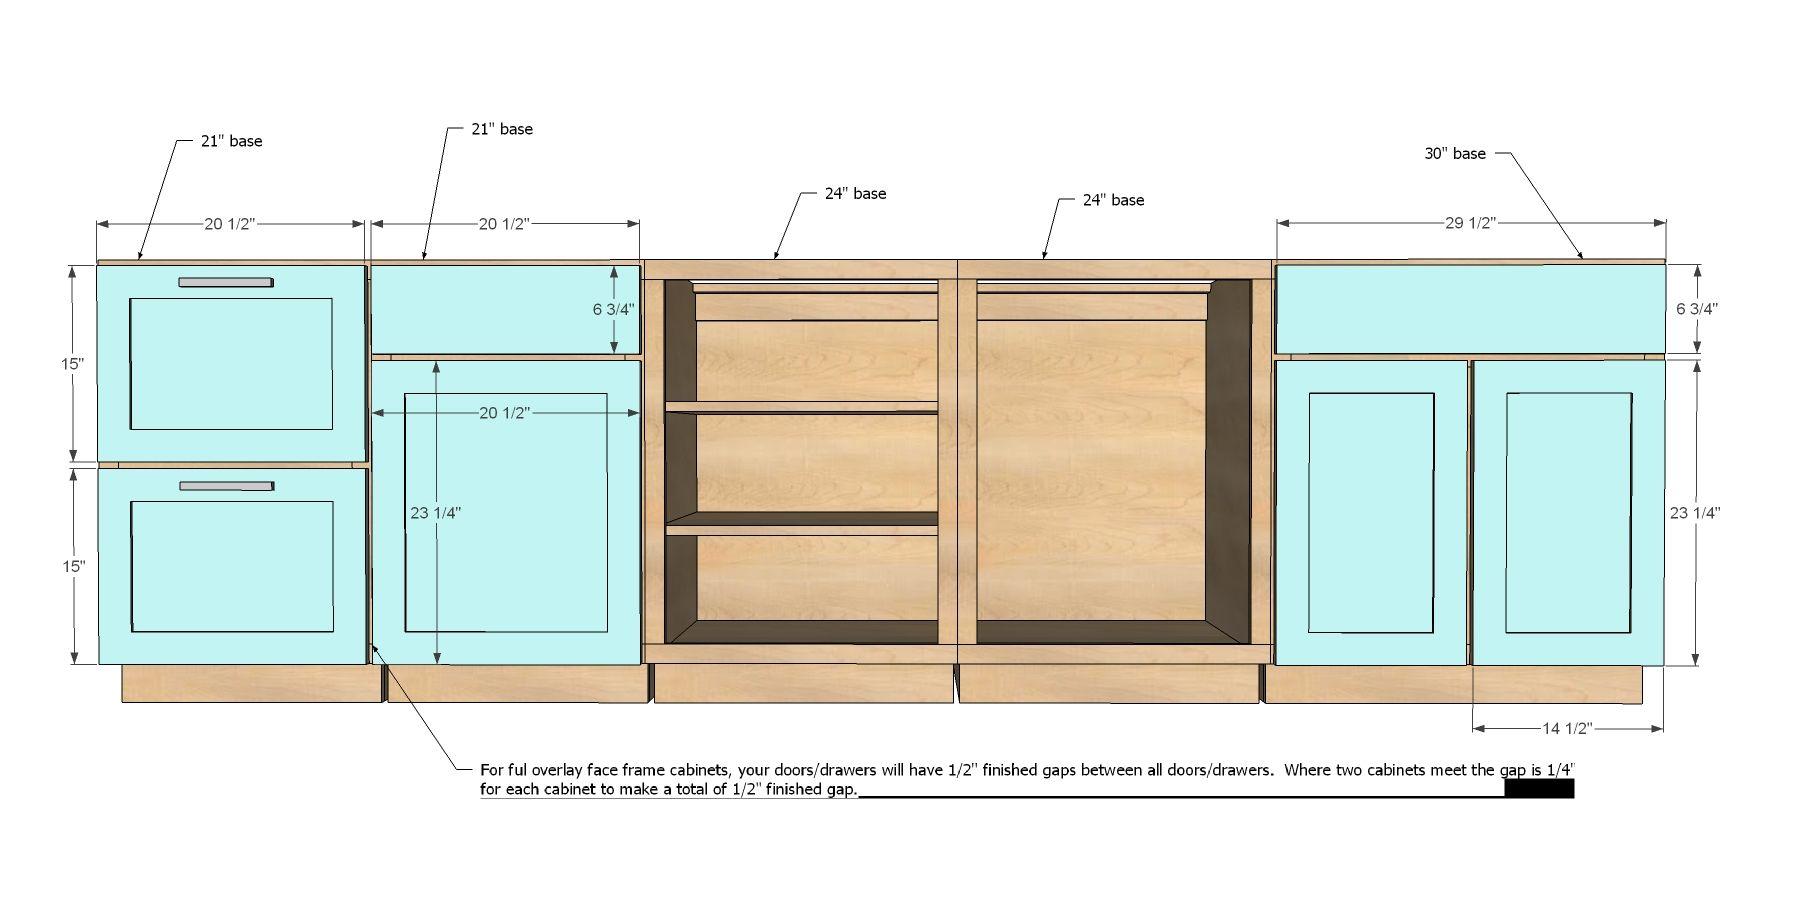 Best Kitchen Gallery: Ana White Build A Face Frame Base Kitchen Cabi Carcass Free of Kitchen Cabinets Base on rachelxblog.com